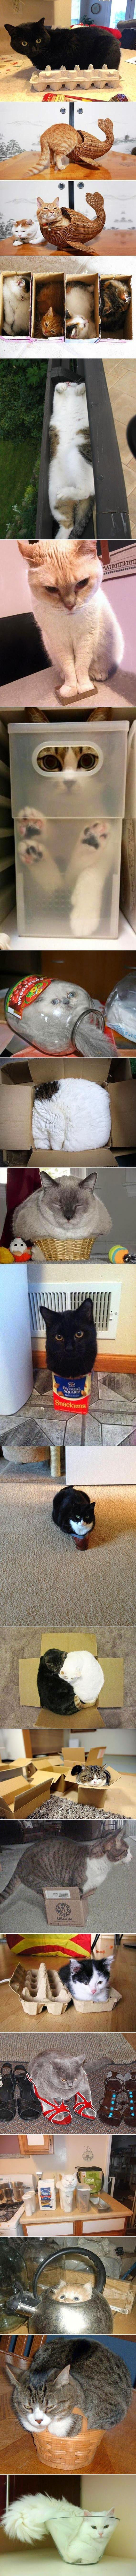 Katzenlaufband.jpg